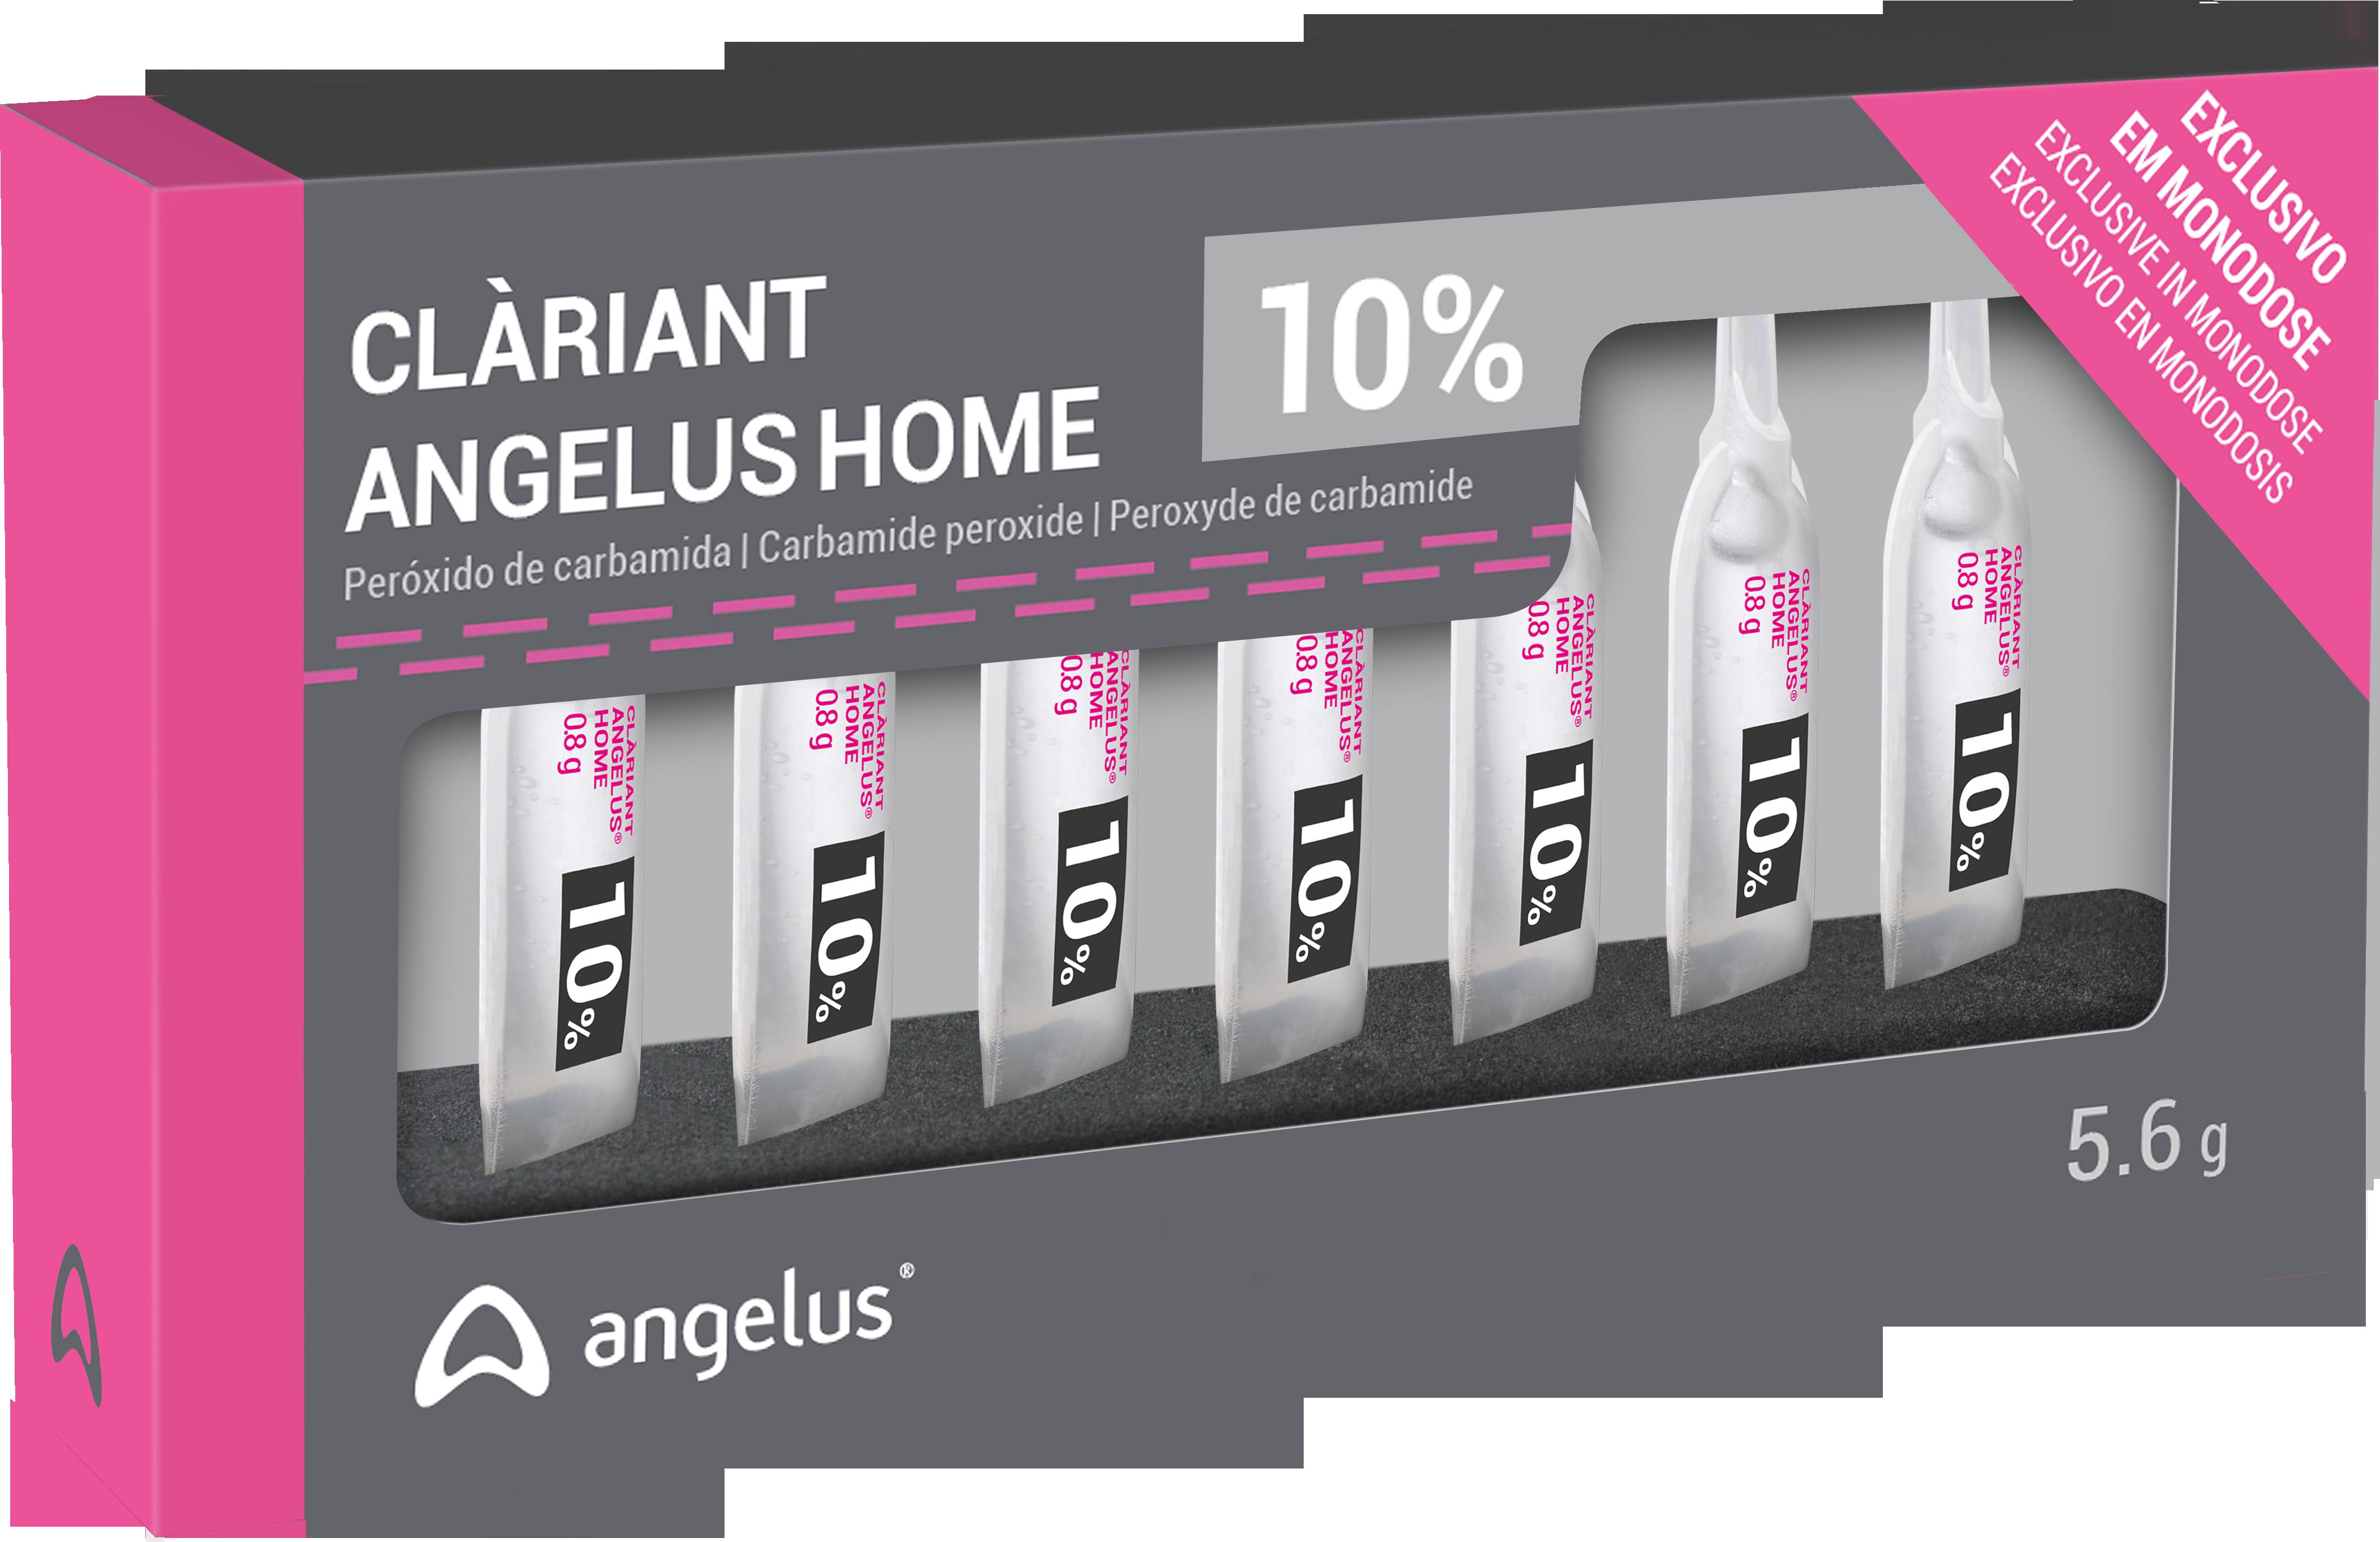 Clàriant Angelus Home Single dose 10%/16%/22%